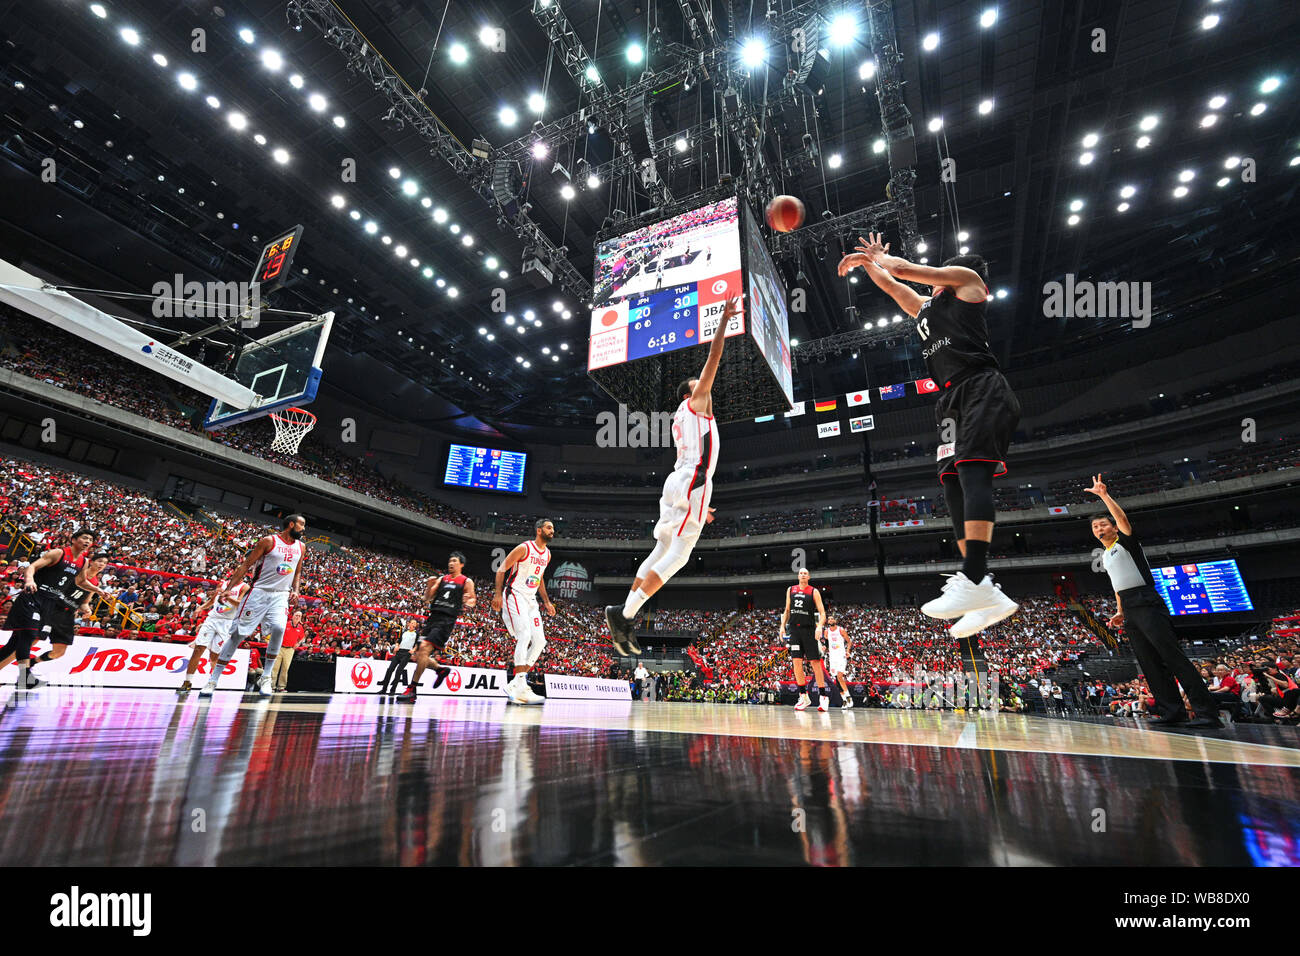 Saitama Super Arena Saitama Japan Credit Matsuo 25th